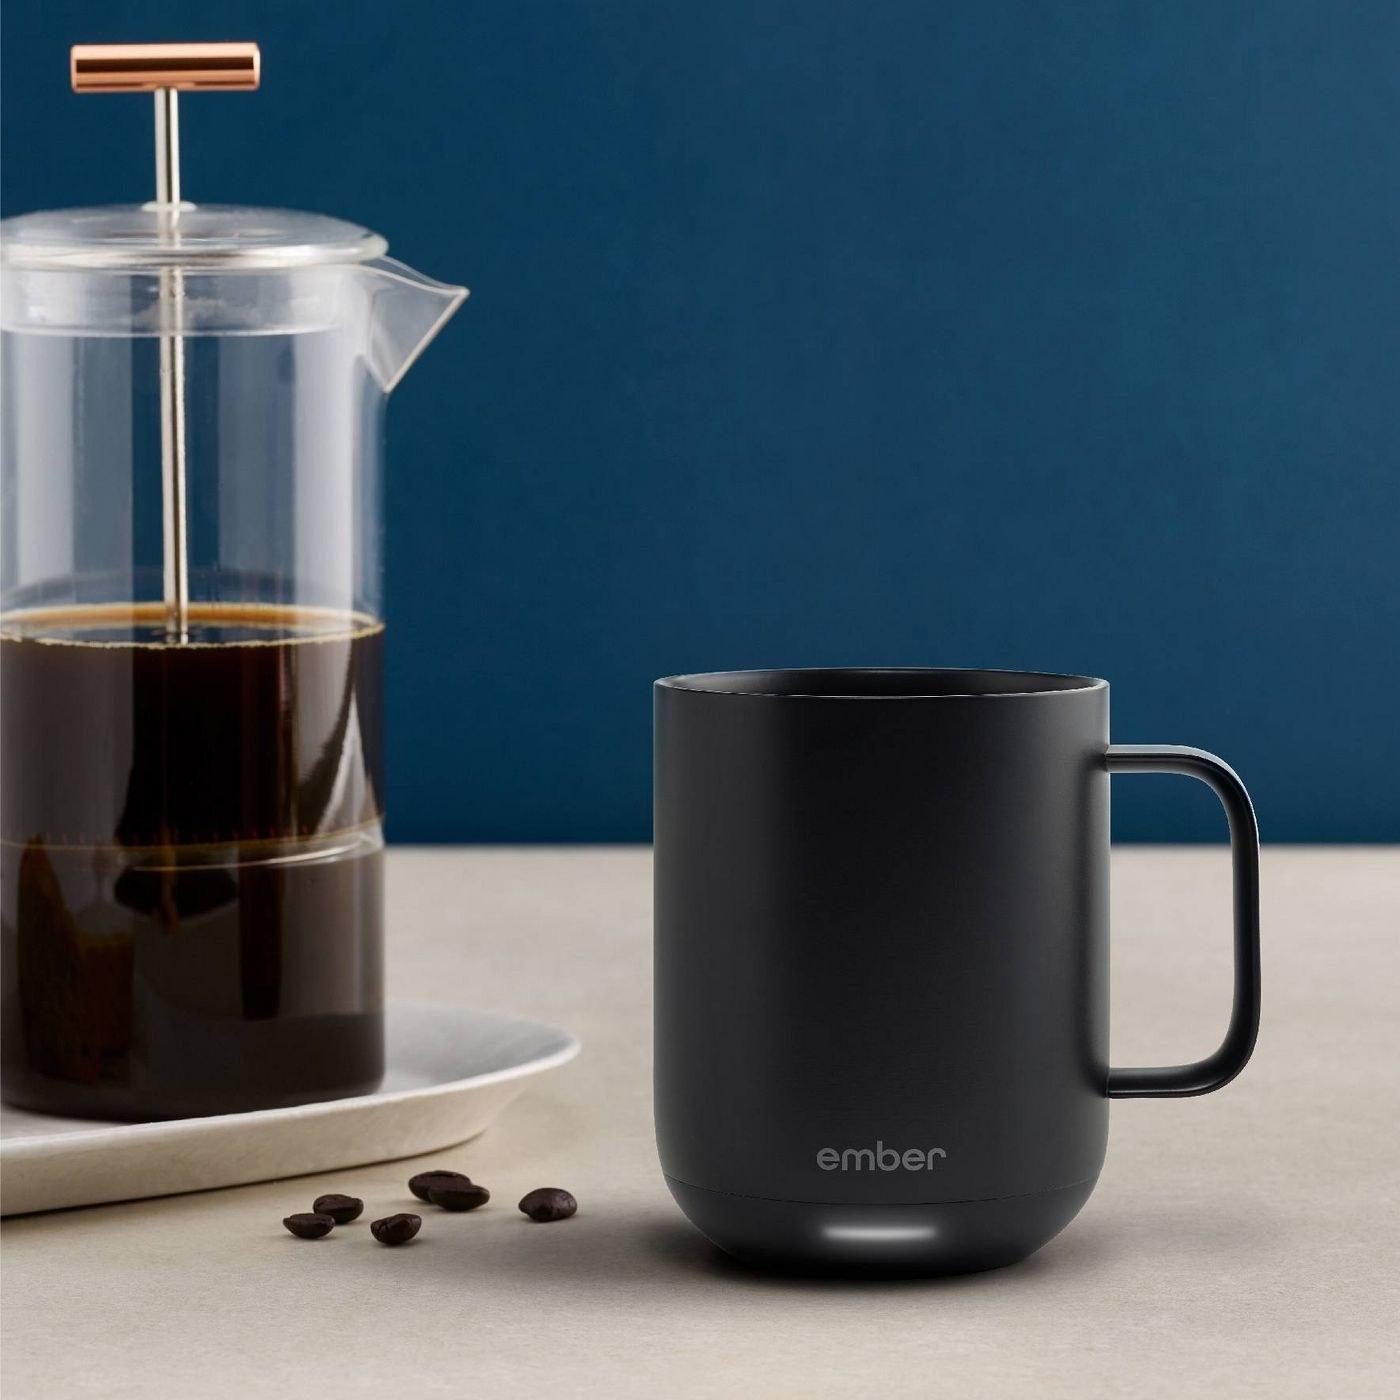 black ember smart mug next to a french press coffee pot